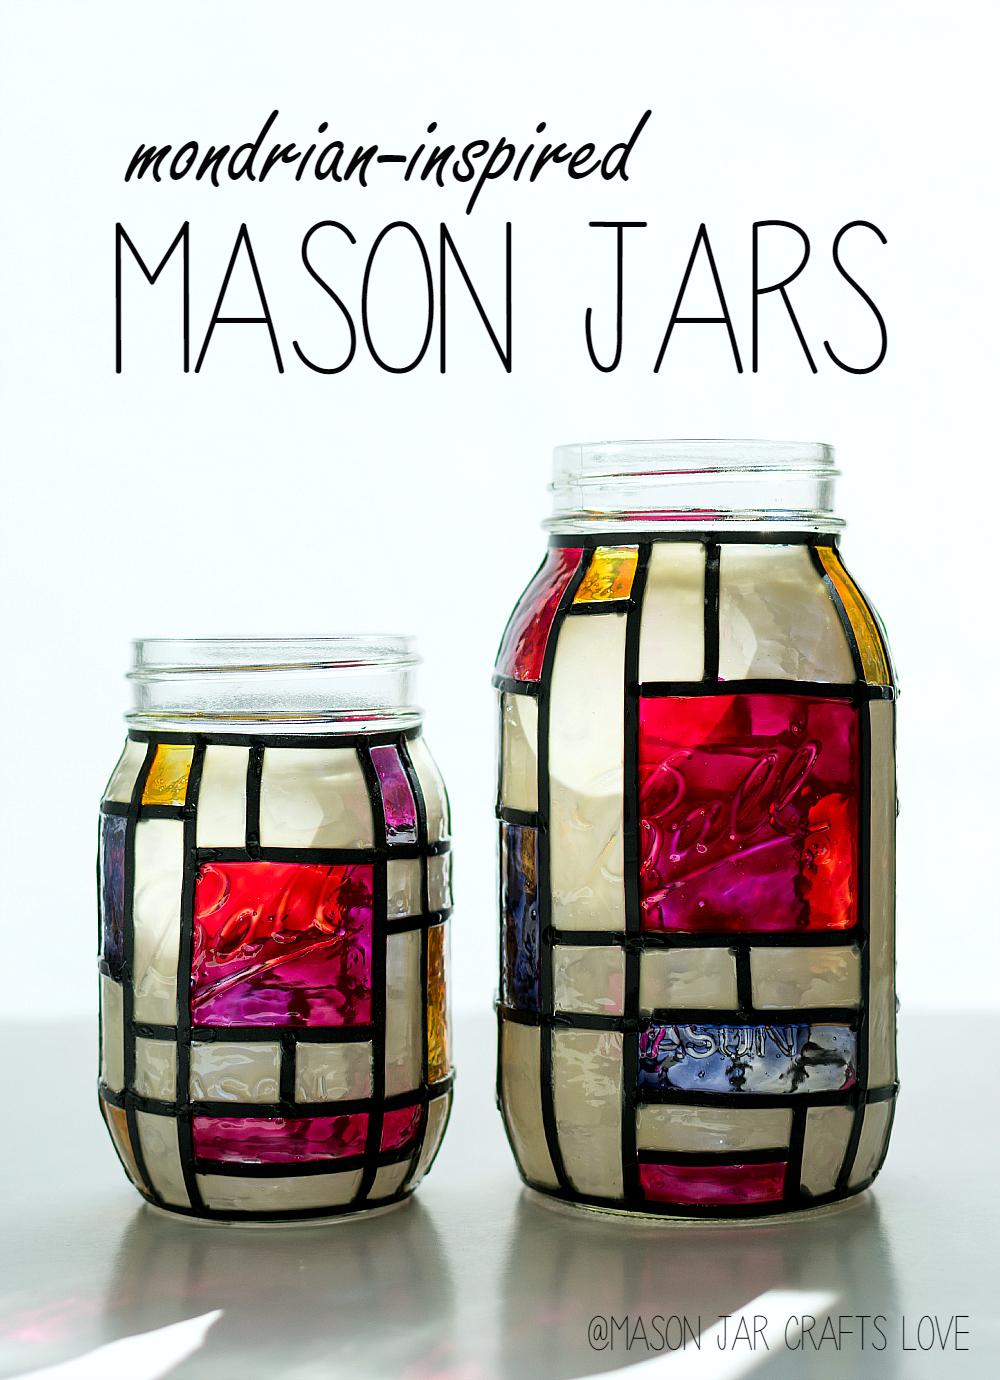 Mondrian Inspired Mason Jars